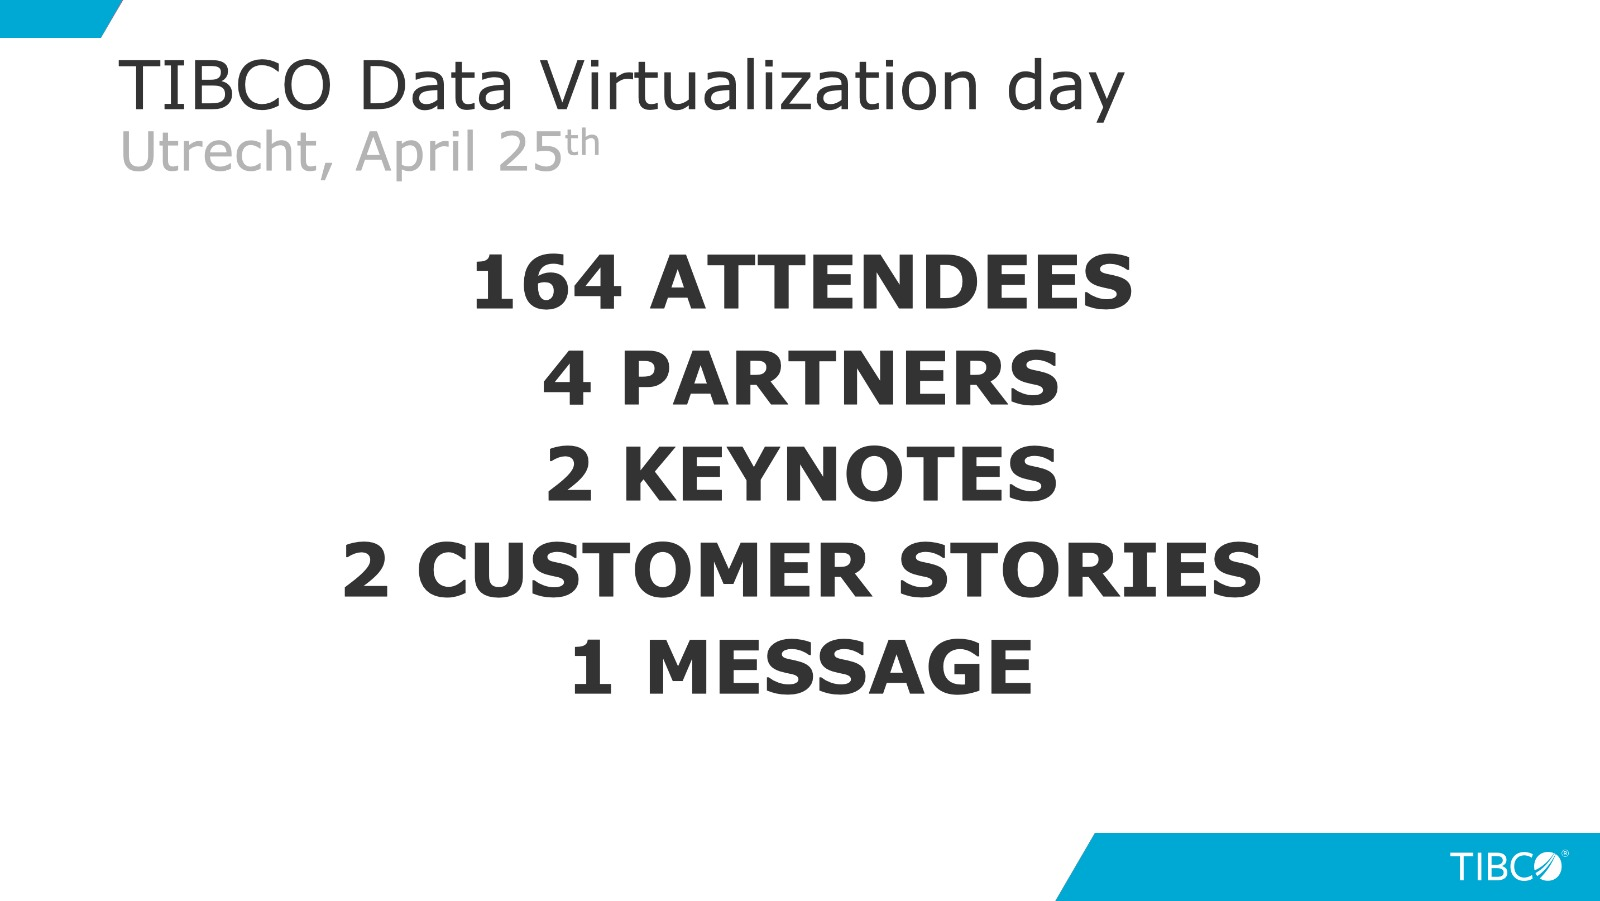 Tibco Data Virtualization Day 2019